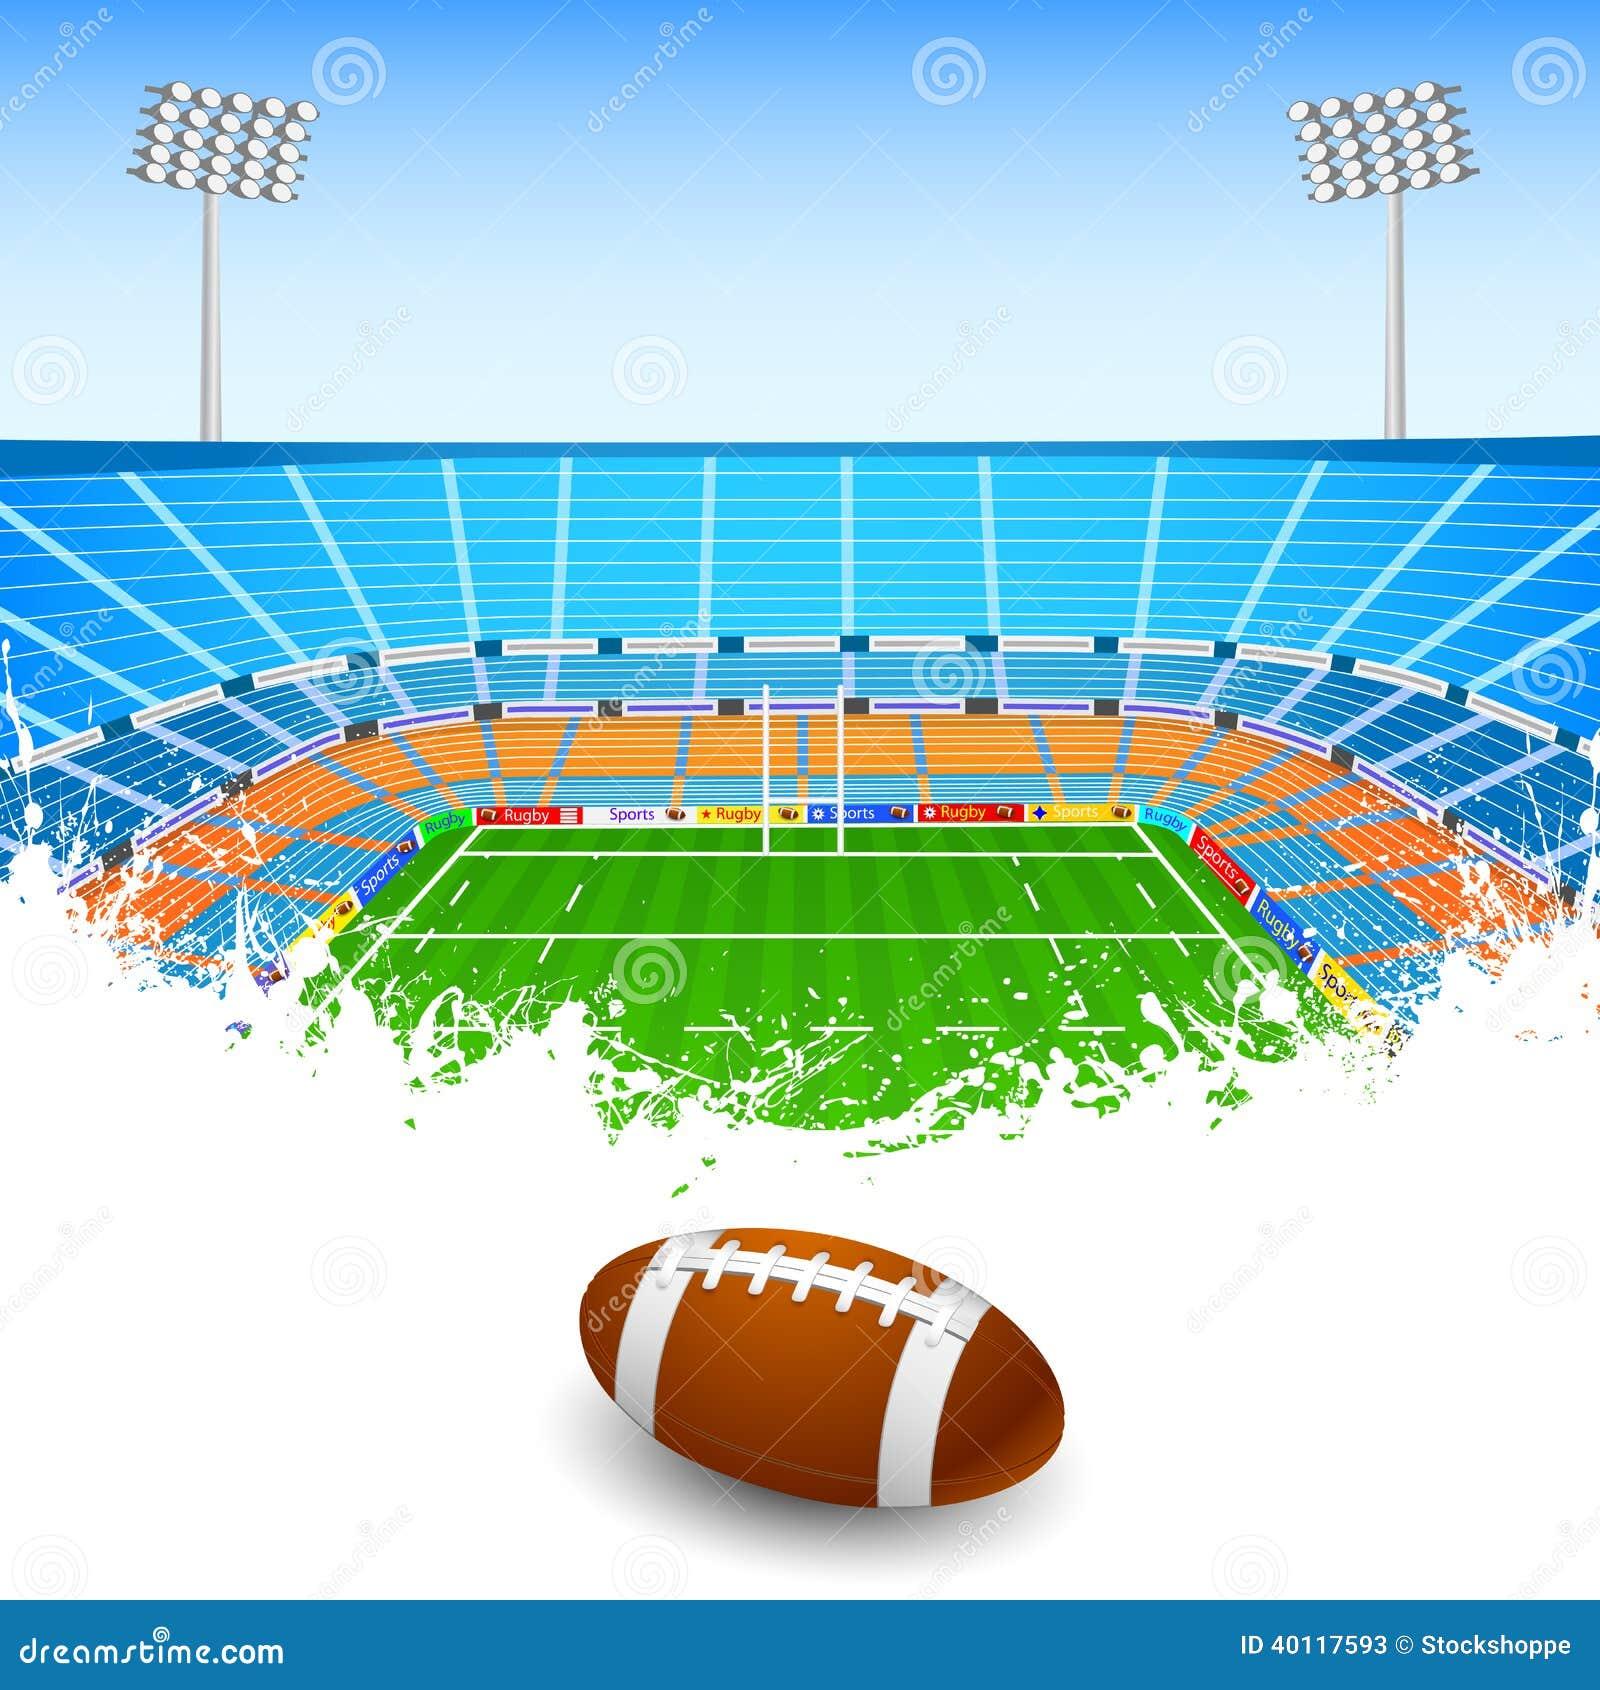 Stadium Lights Svg: Rugby Ball On Stadium Stock Vector. Illustration Of